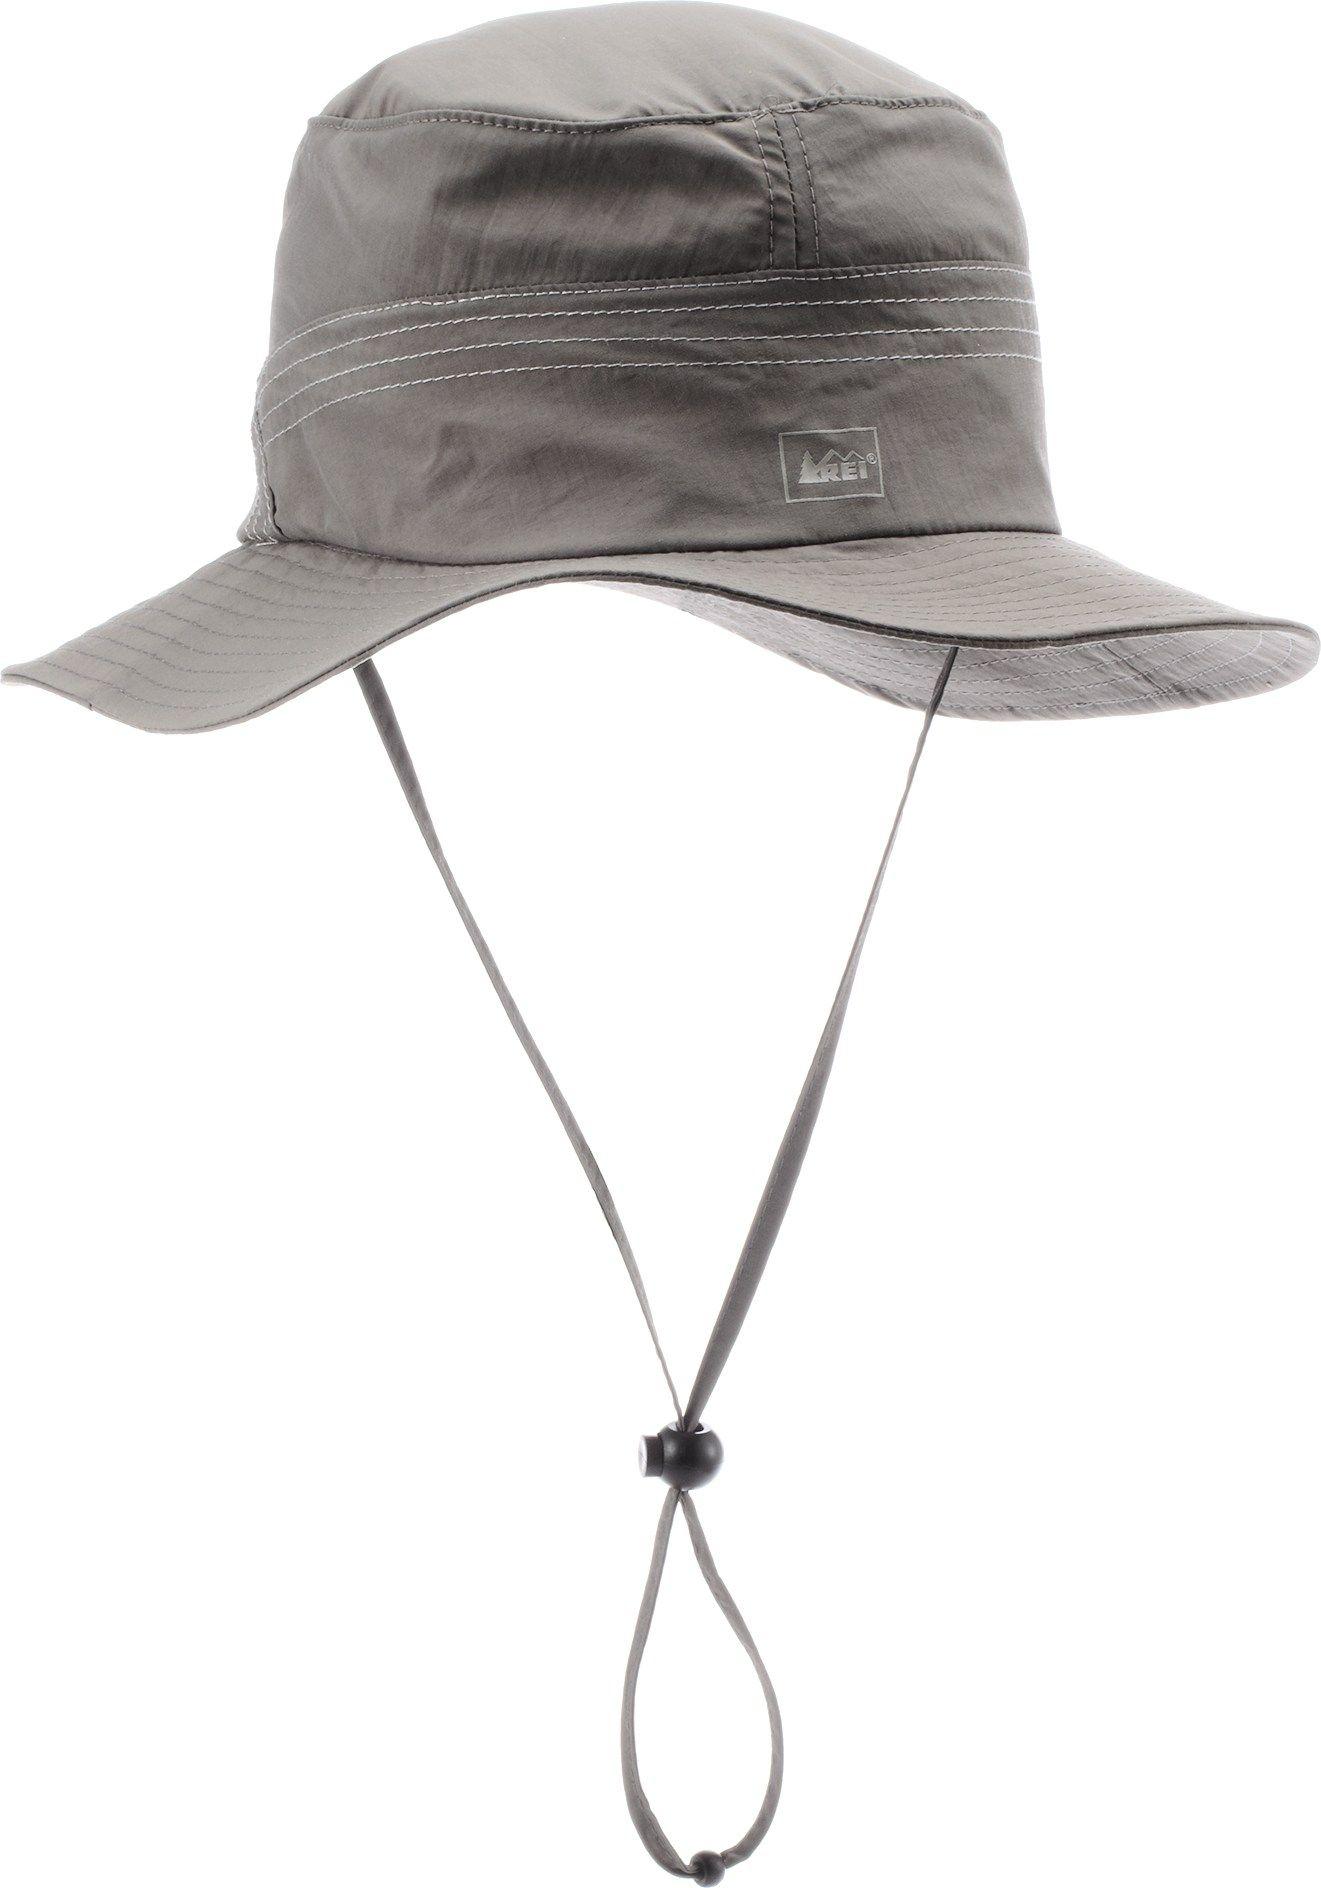 5452f4aa3 Rei Female Paddler Hat - Women's | *Apparel & Accessories* | Hats ...